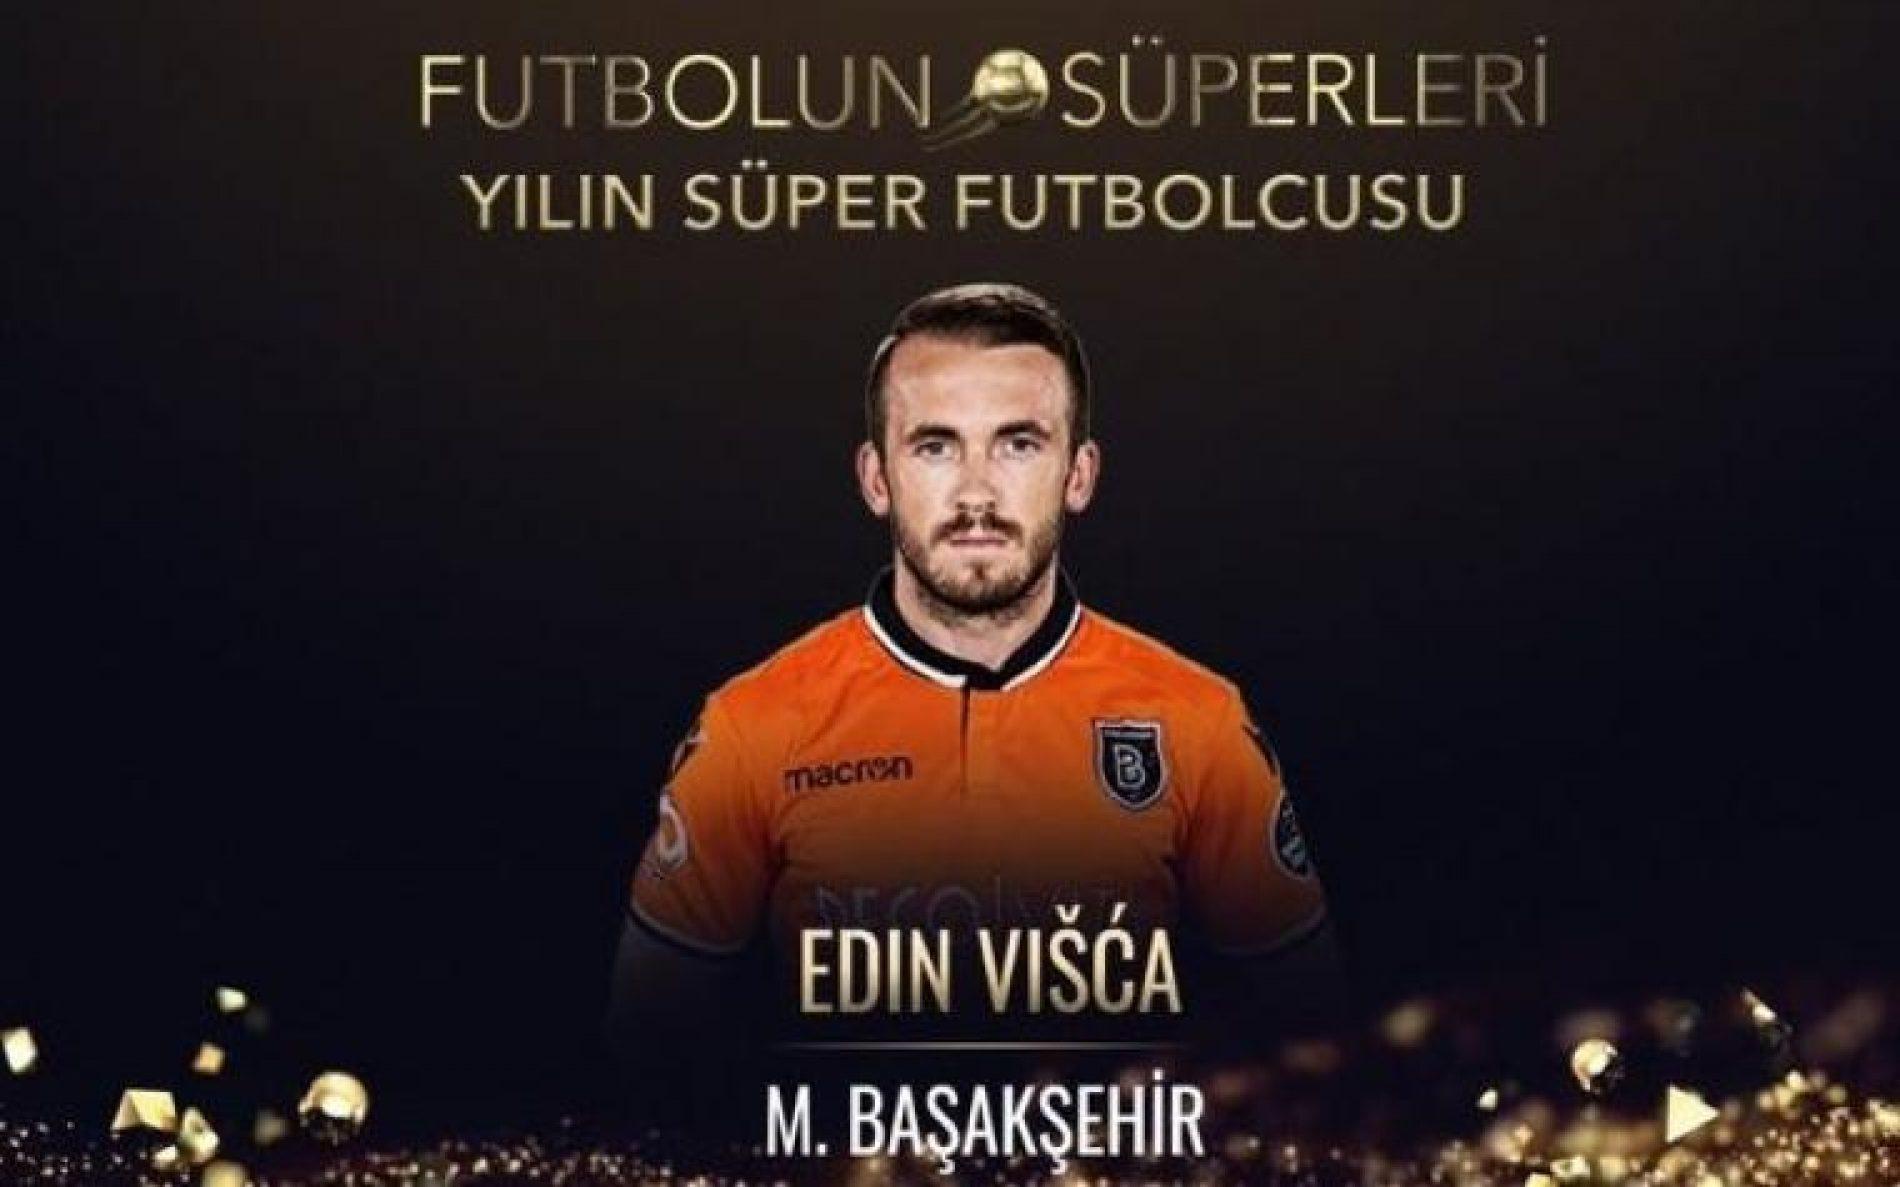 Veliko priznanje za bosanskog reprezentativca: Višća najbolji fudbaler turske Superlige!